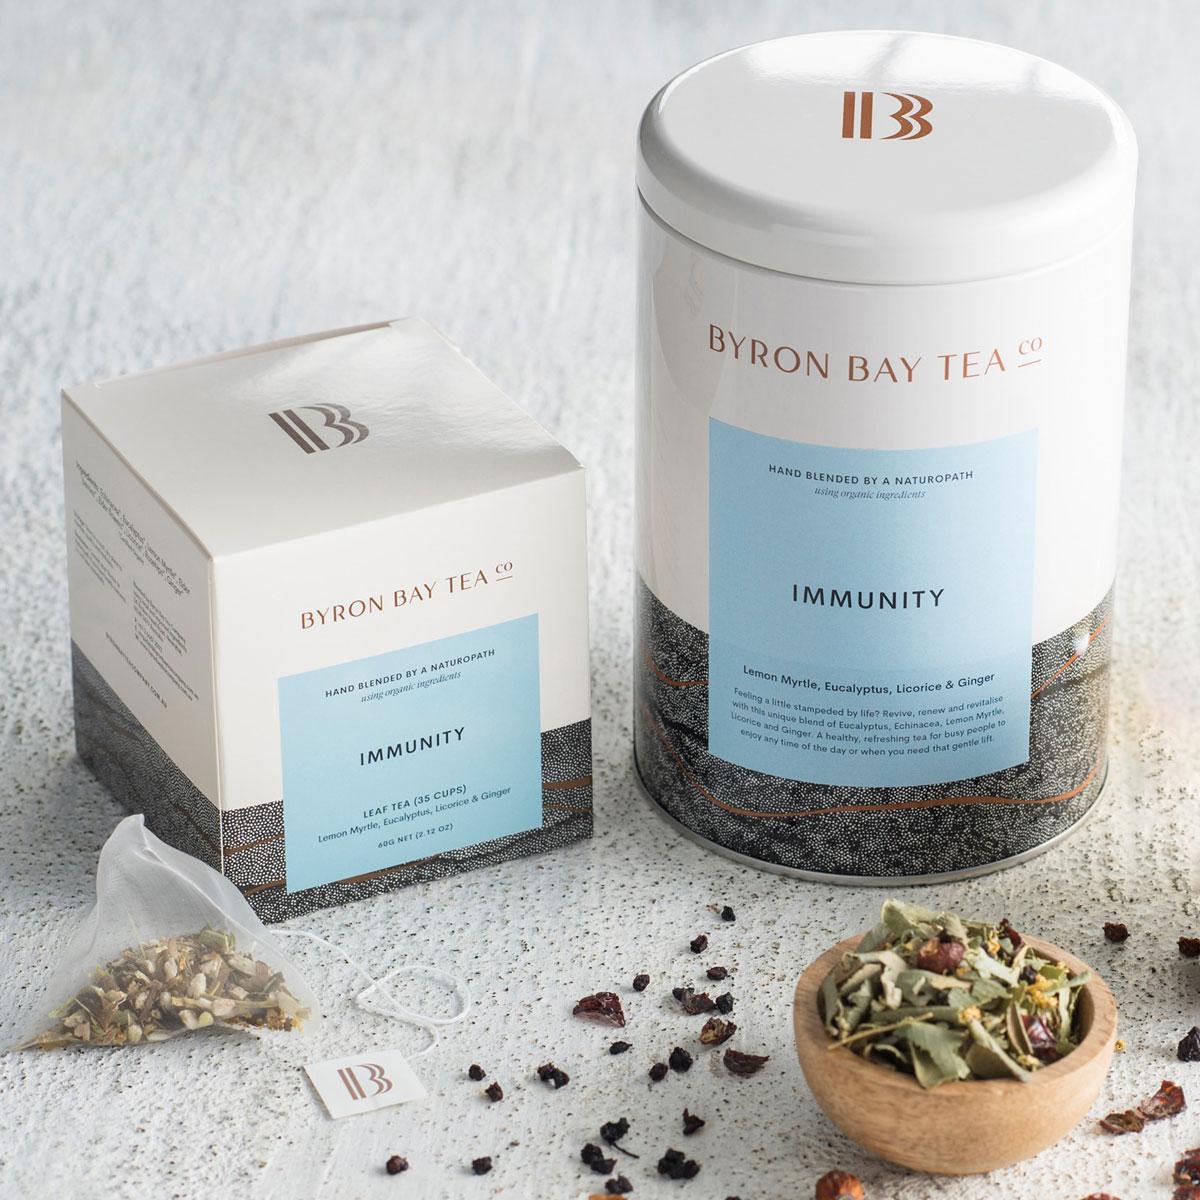 Byron Bay Tea Co Immunity Tea Teabags 40g